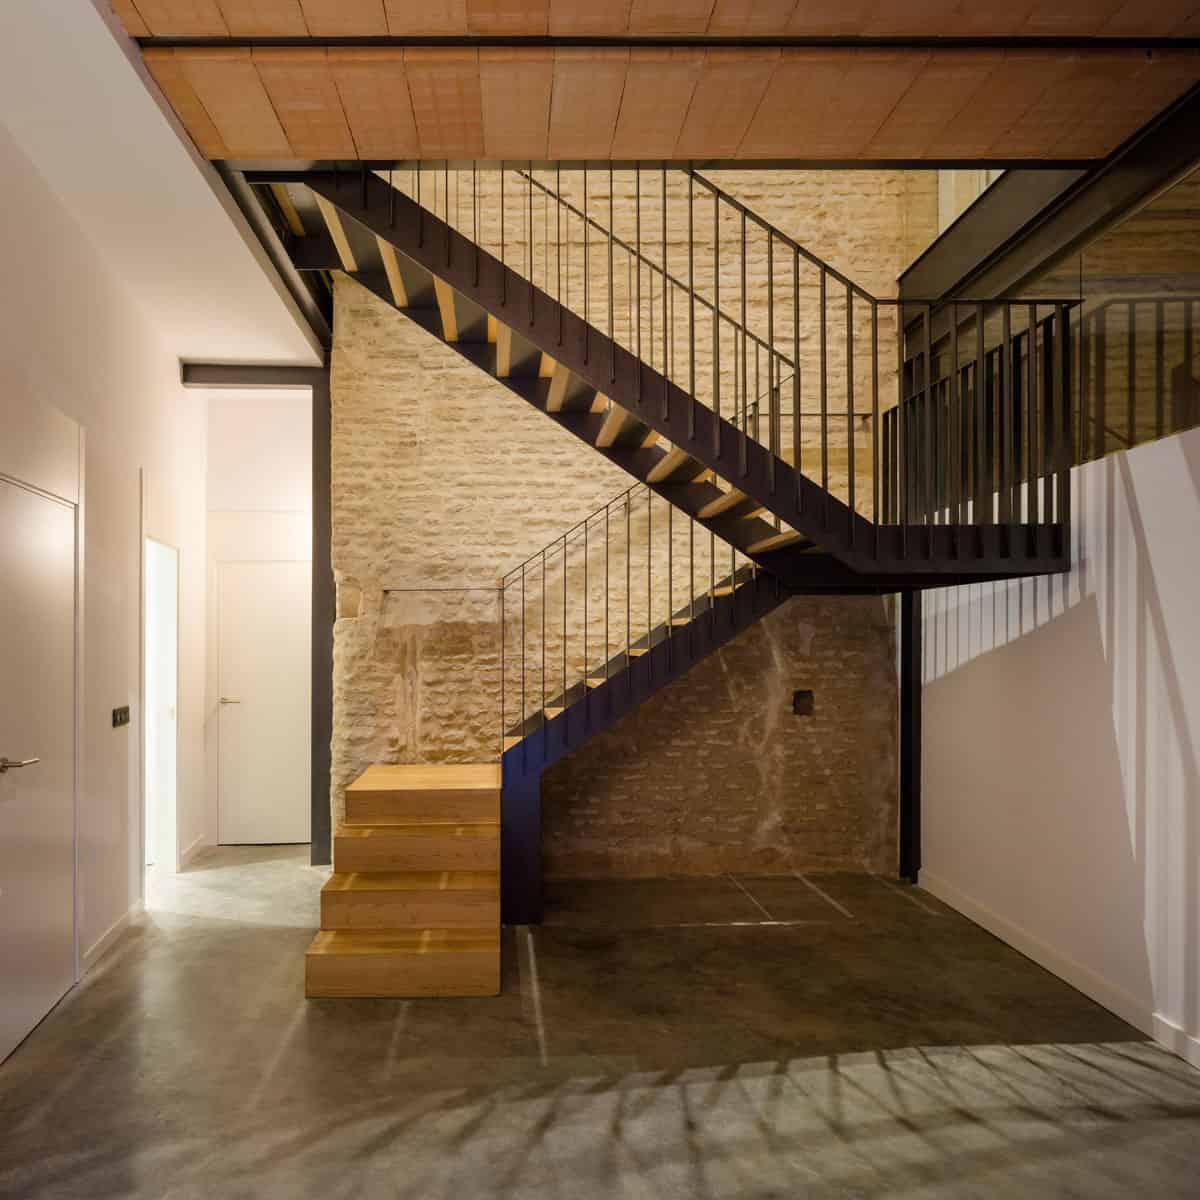 House Refurbishment by Pablo Baruc (3)